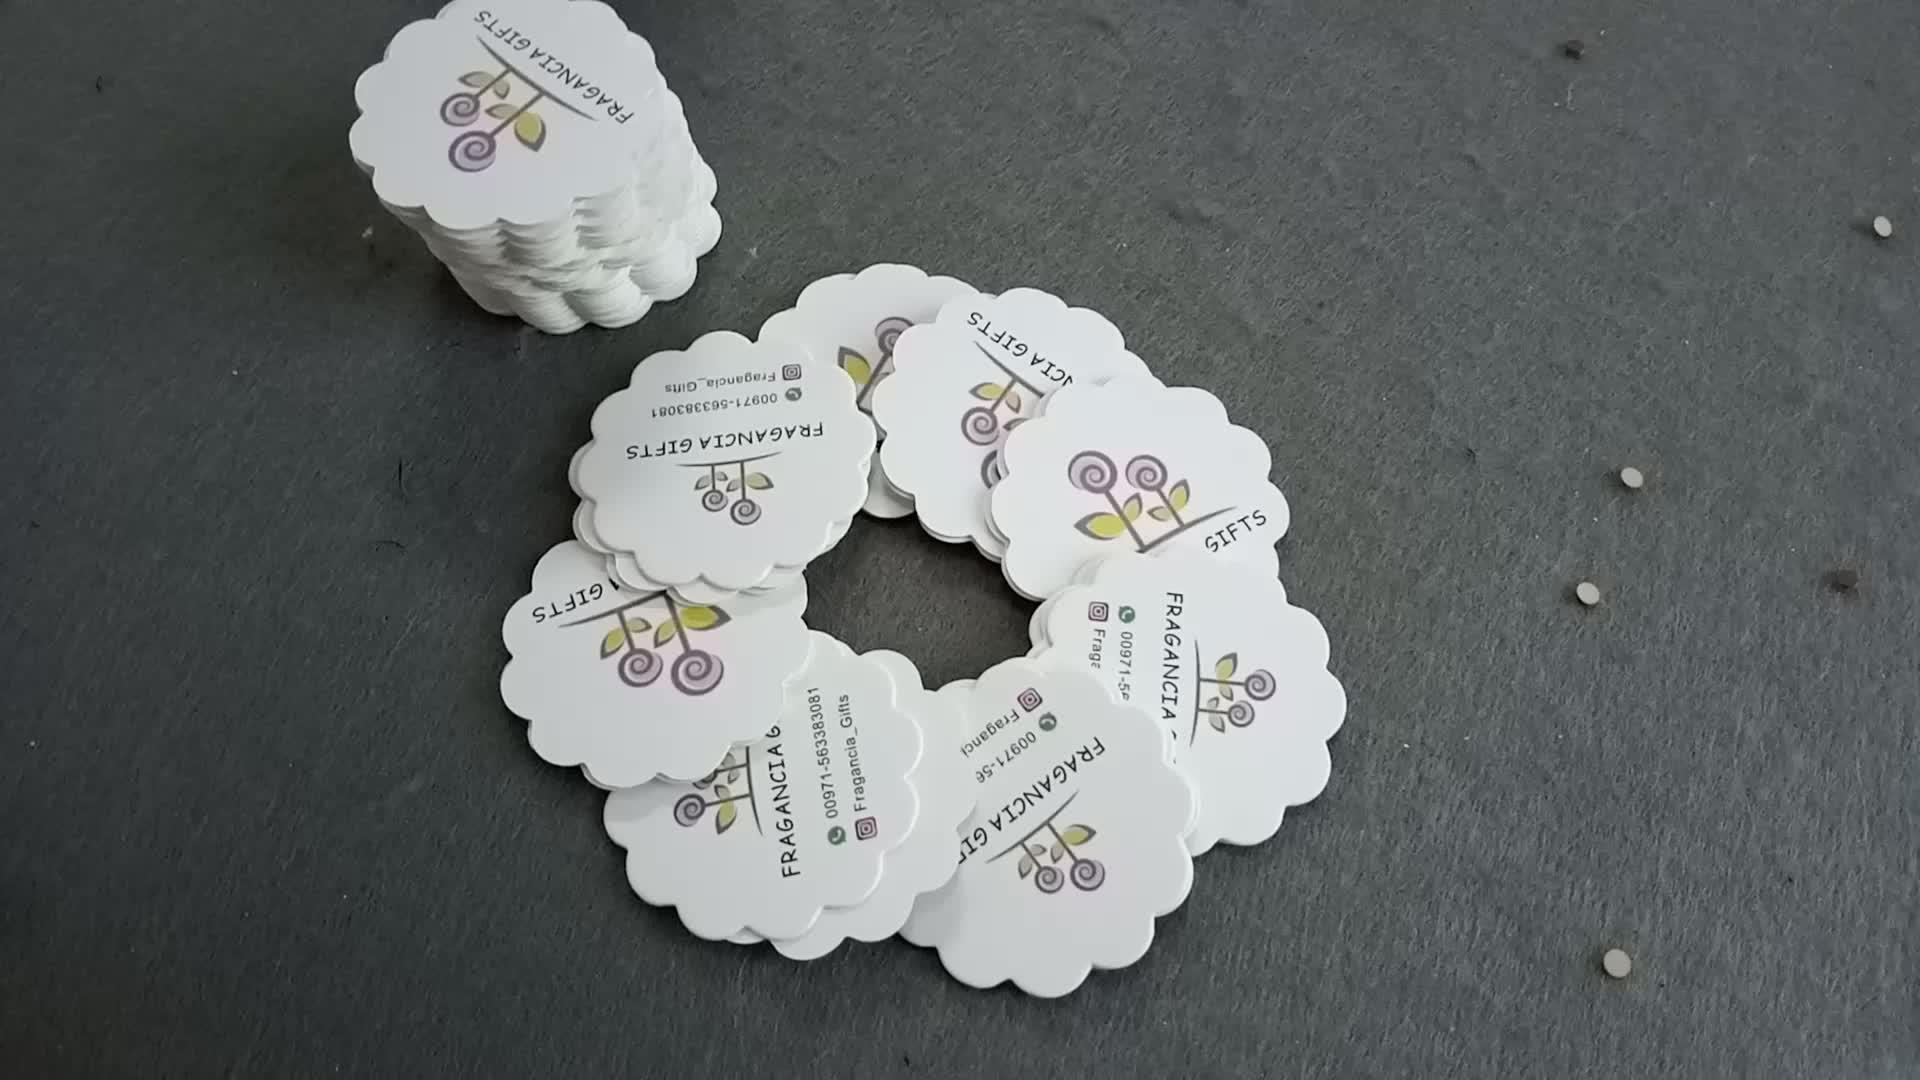 Design de moda do cliente marcas tag do cair redondo feito sob encomenda etiqueta tag do cair